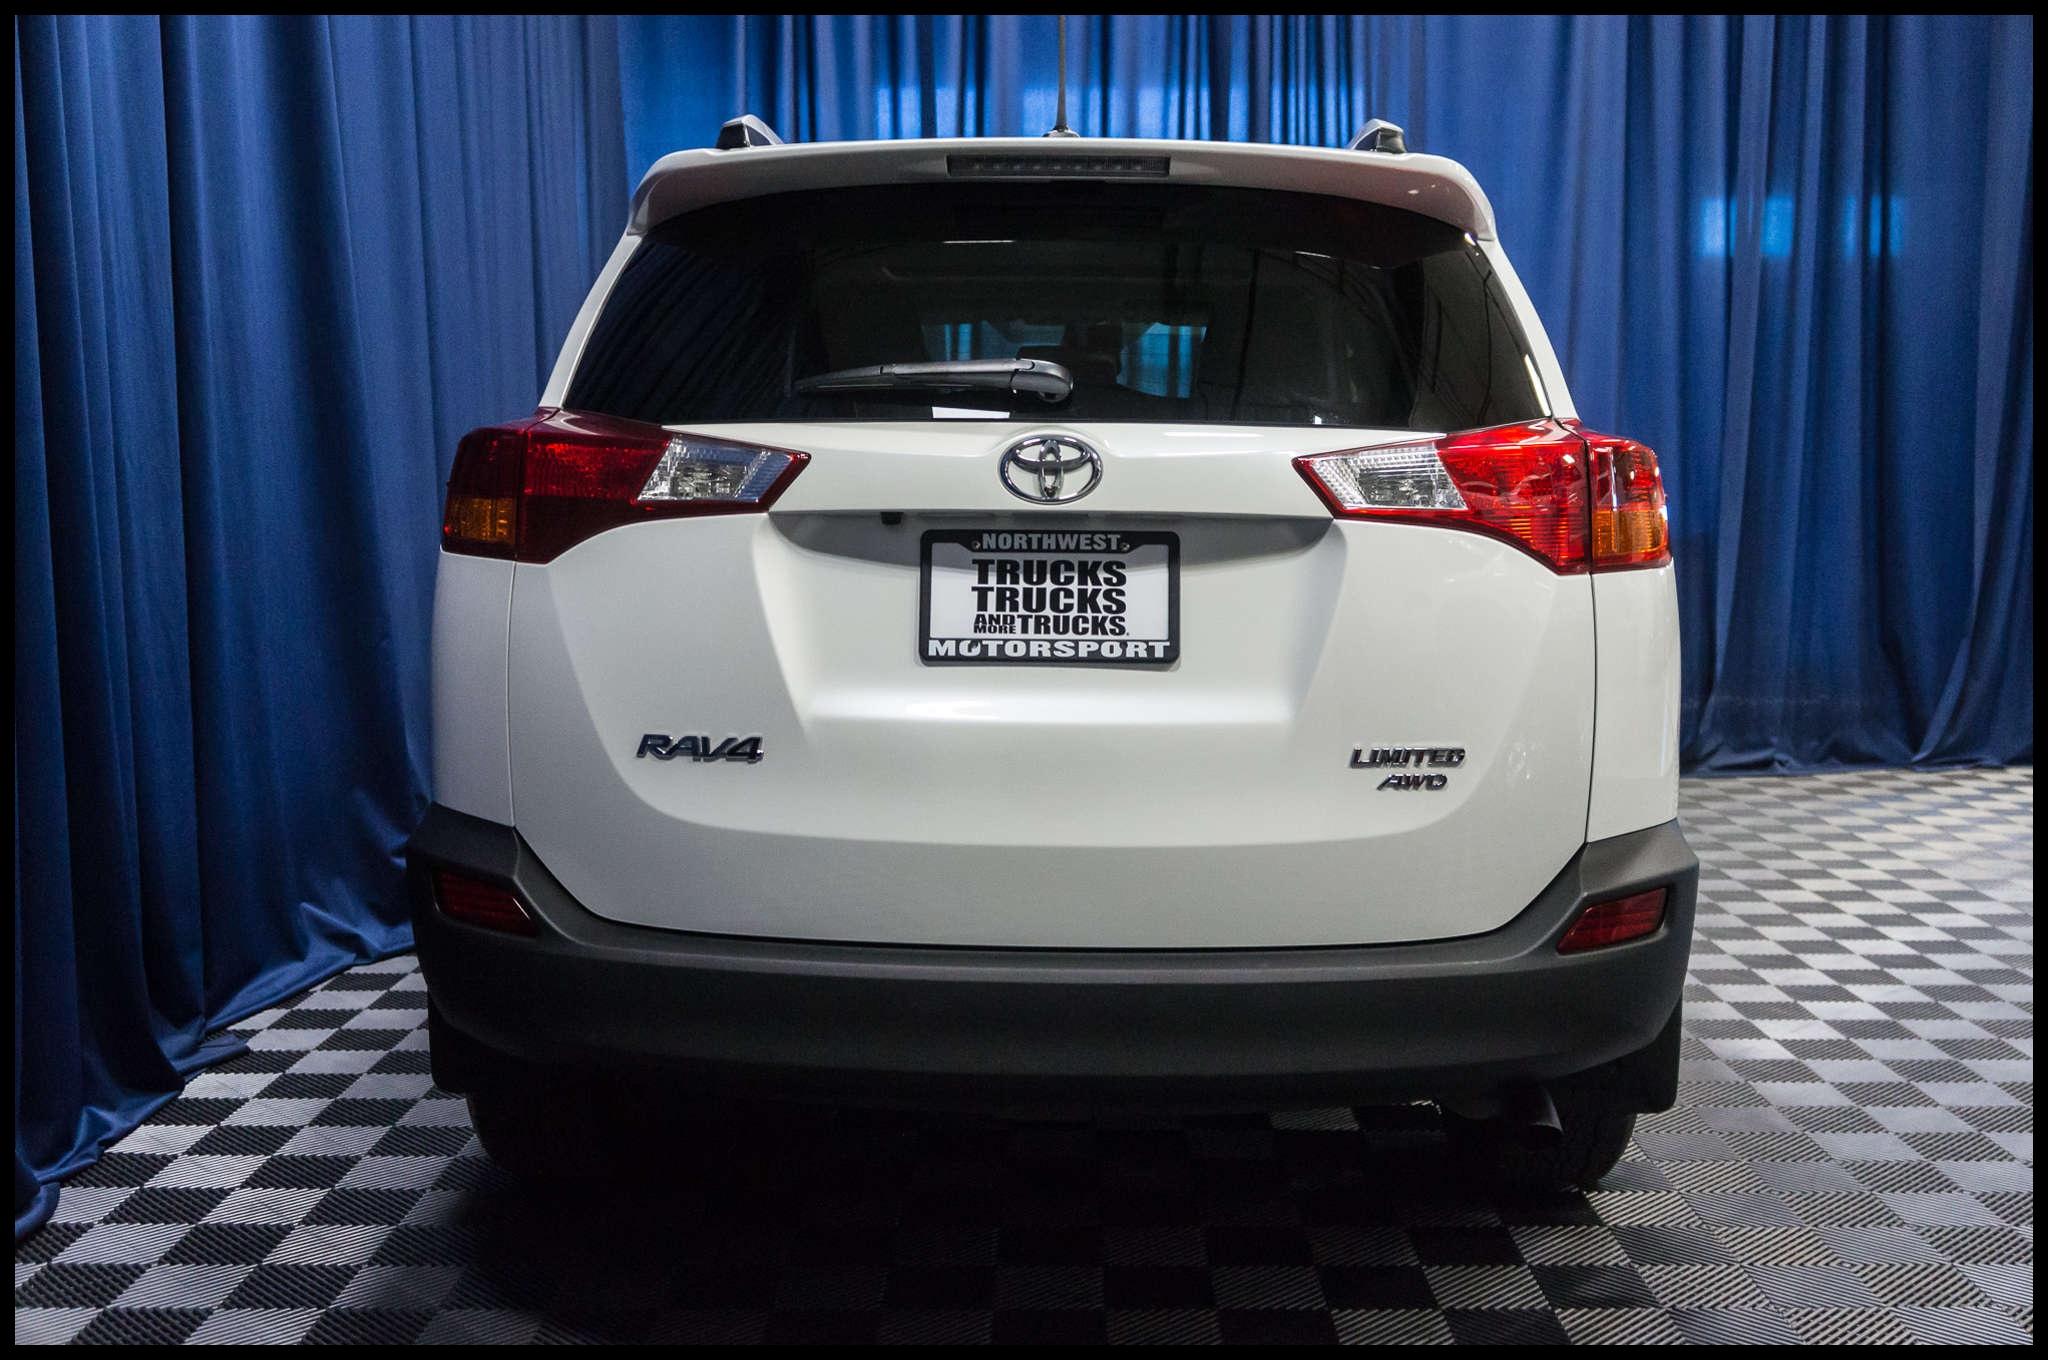 News toyota Awd Vehicles 2015 New 2015 toyota Rav4 Limited Awd Vehicle Reviews